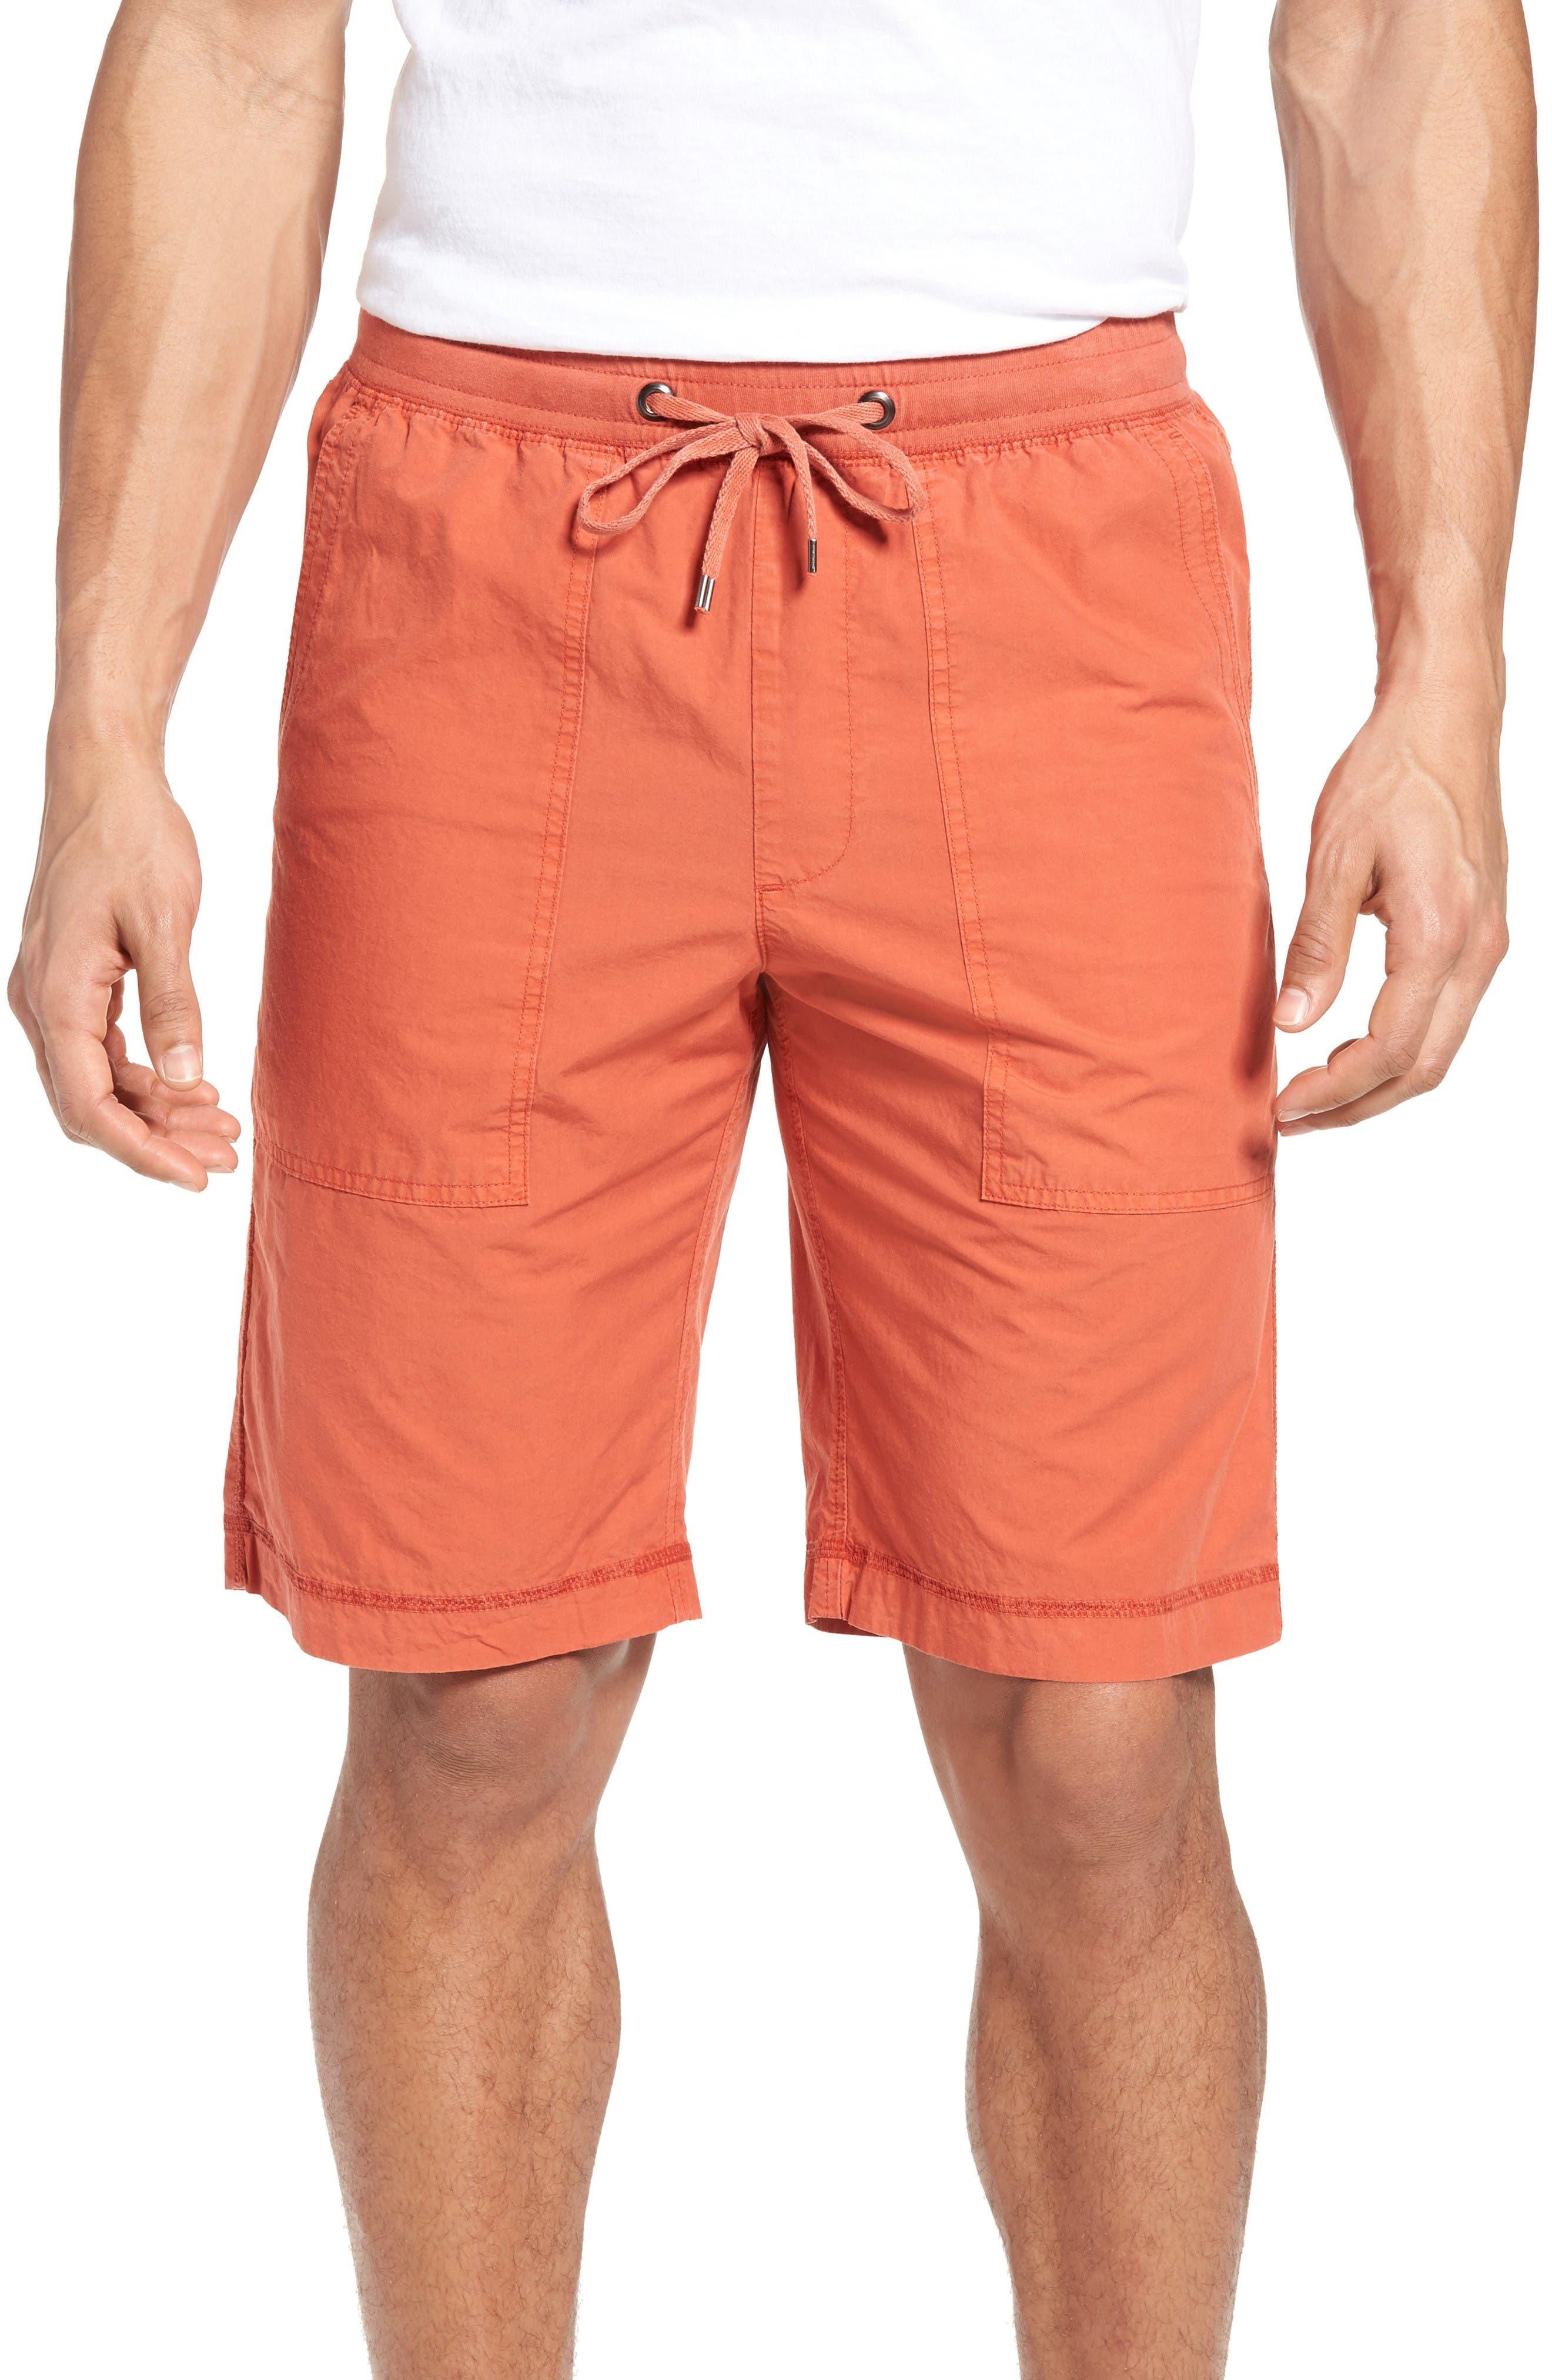 Portside Shorts,                             Main thumbnail 1, color,                             Lobster